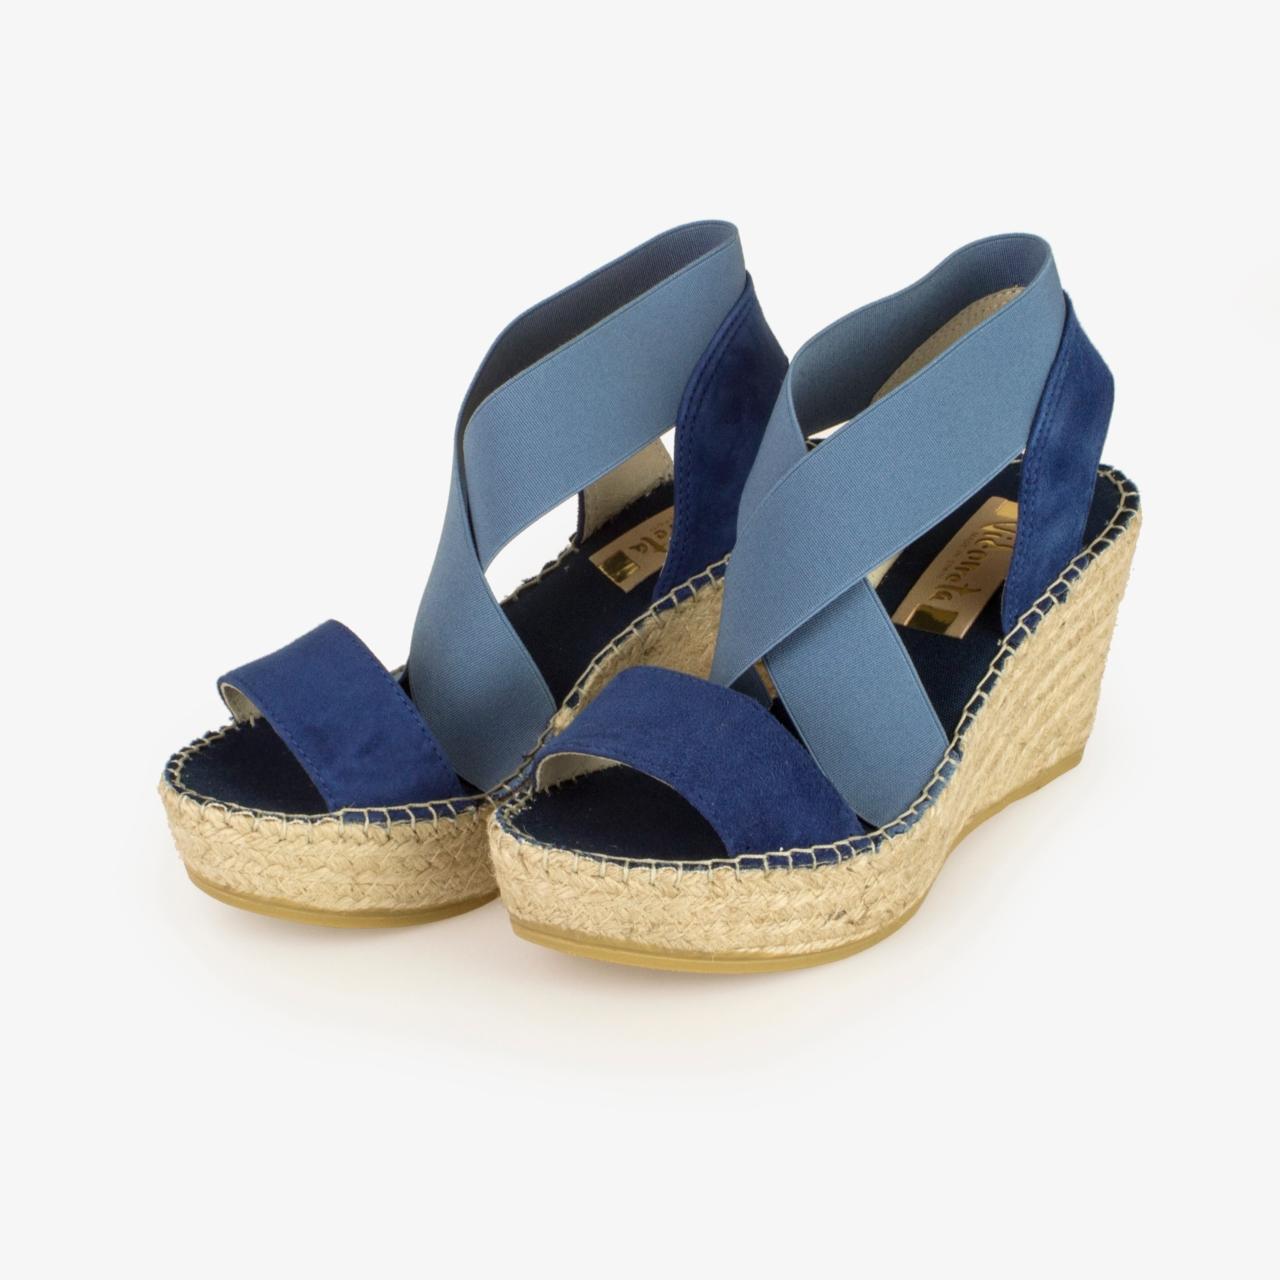 Sandalia Cuña Yute Azul - Ítem1